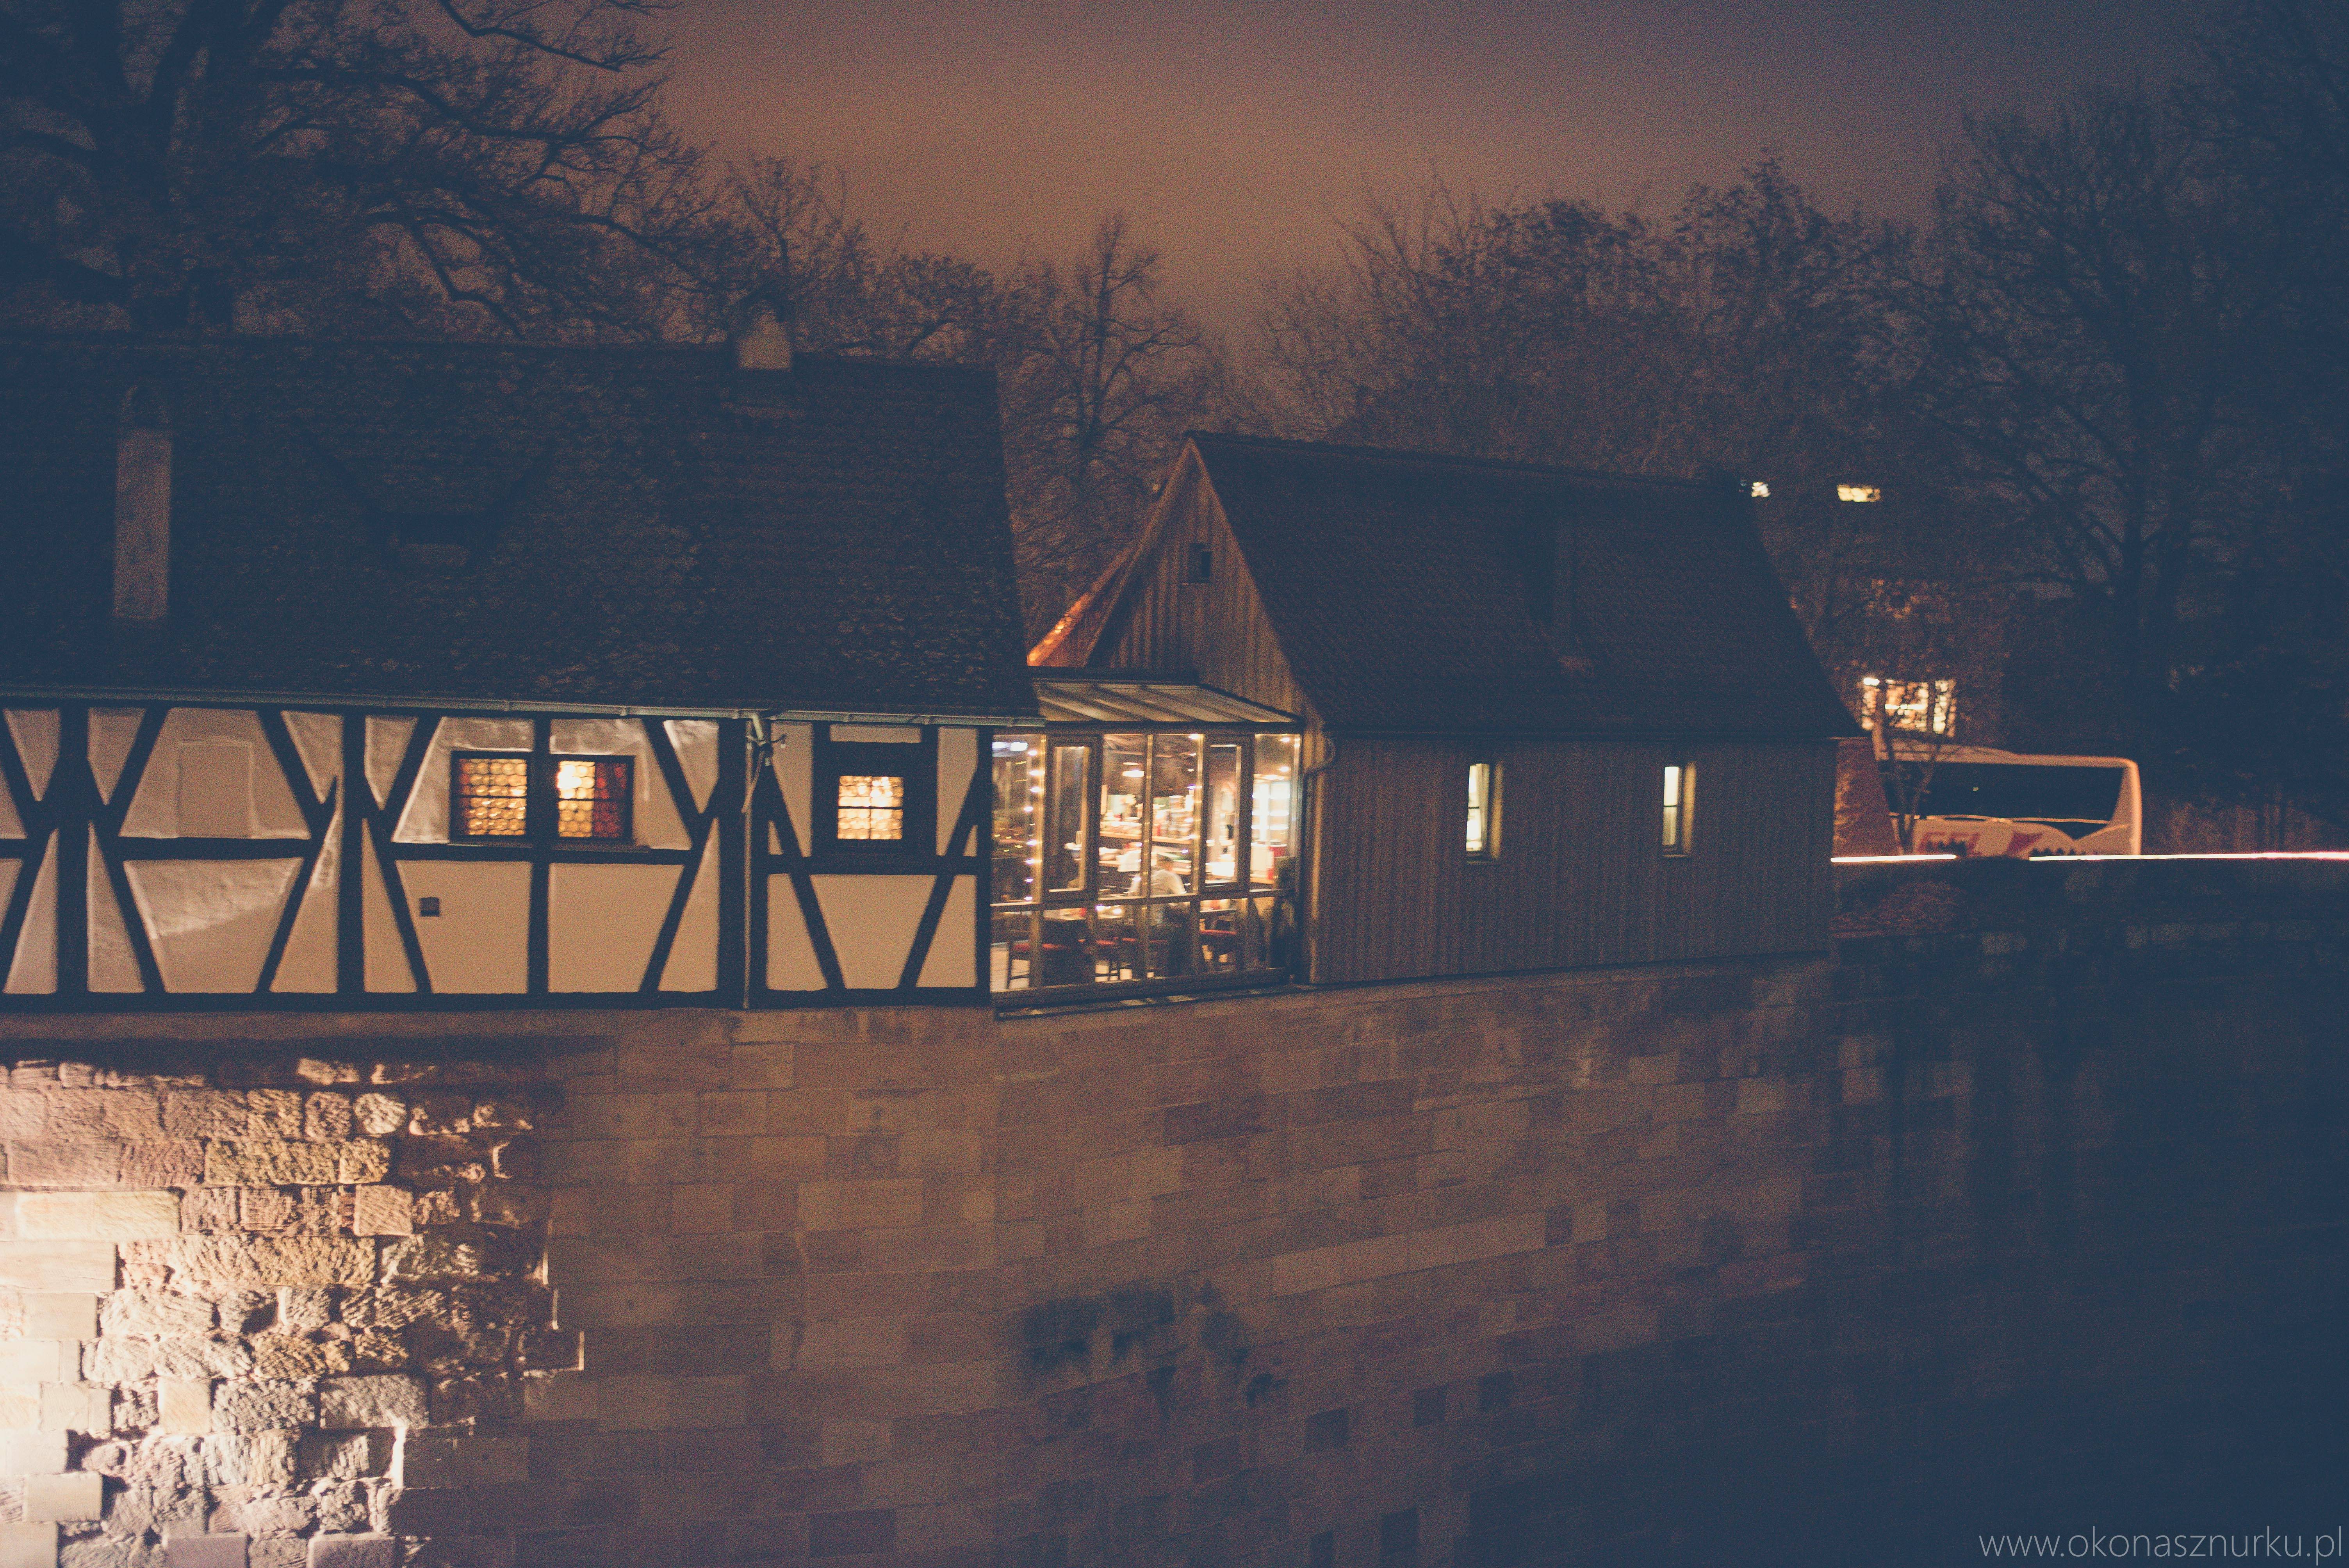 Nürnberg-stadt-norymberga-bayern-city-frankonia (13)